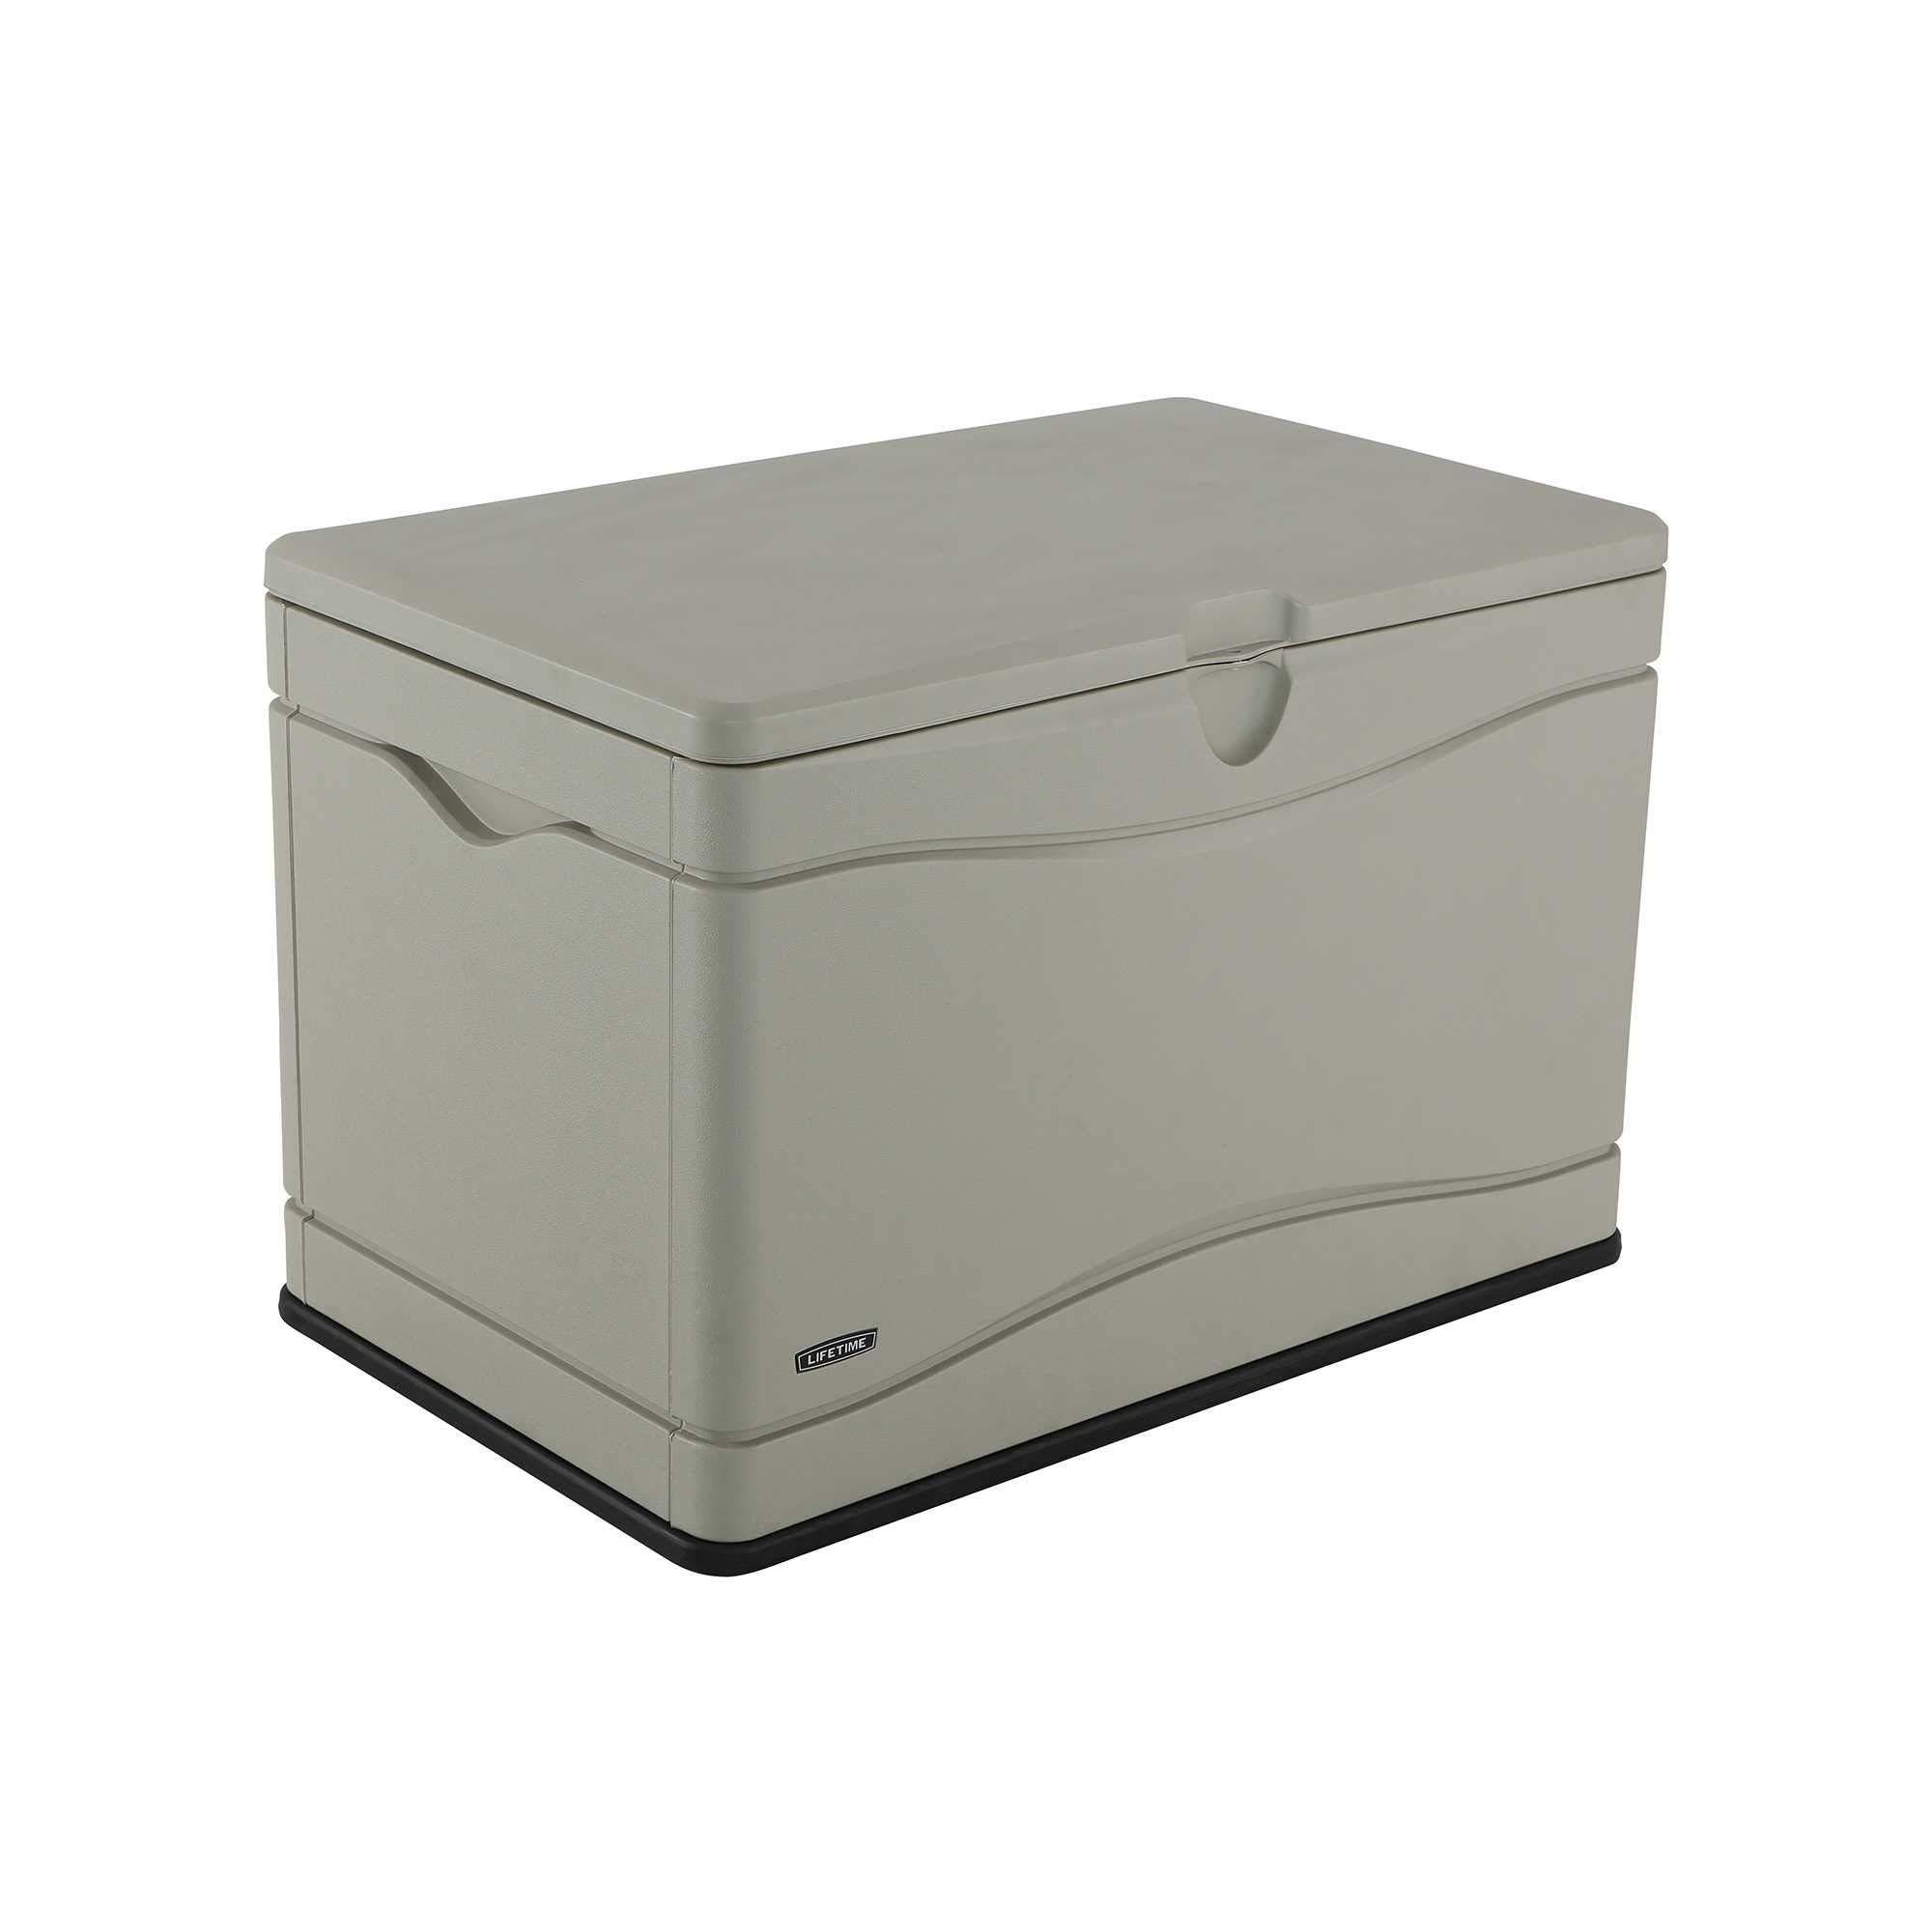 Lifetime 60059 Outdoor Storage Deck Box, 80 Gallon, Desert Sand by Lifetime